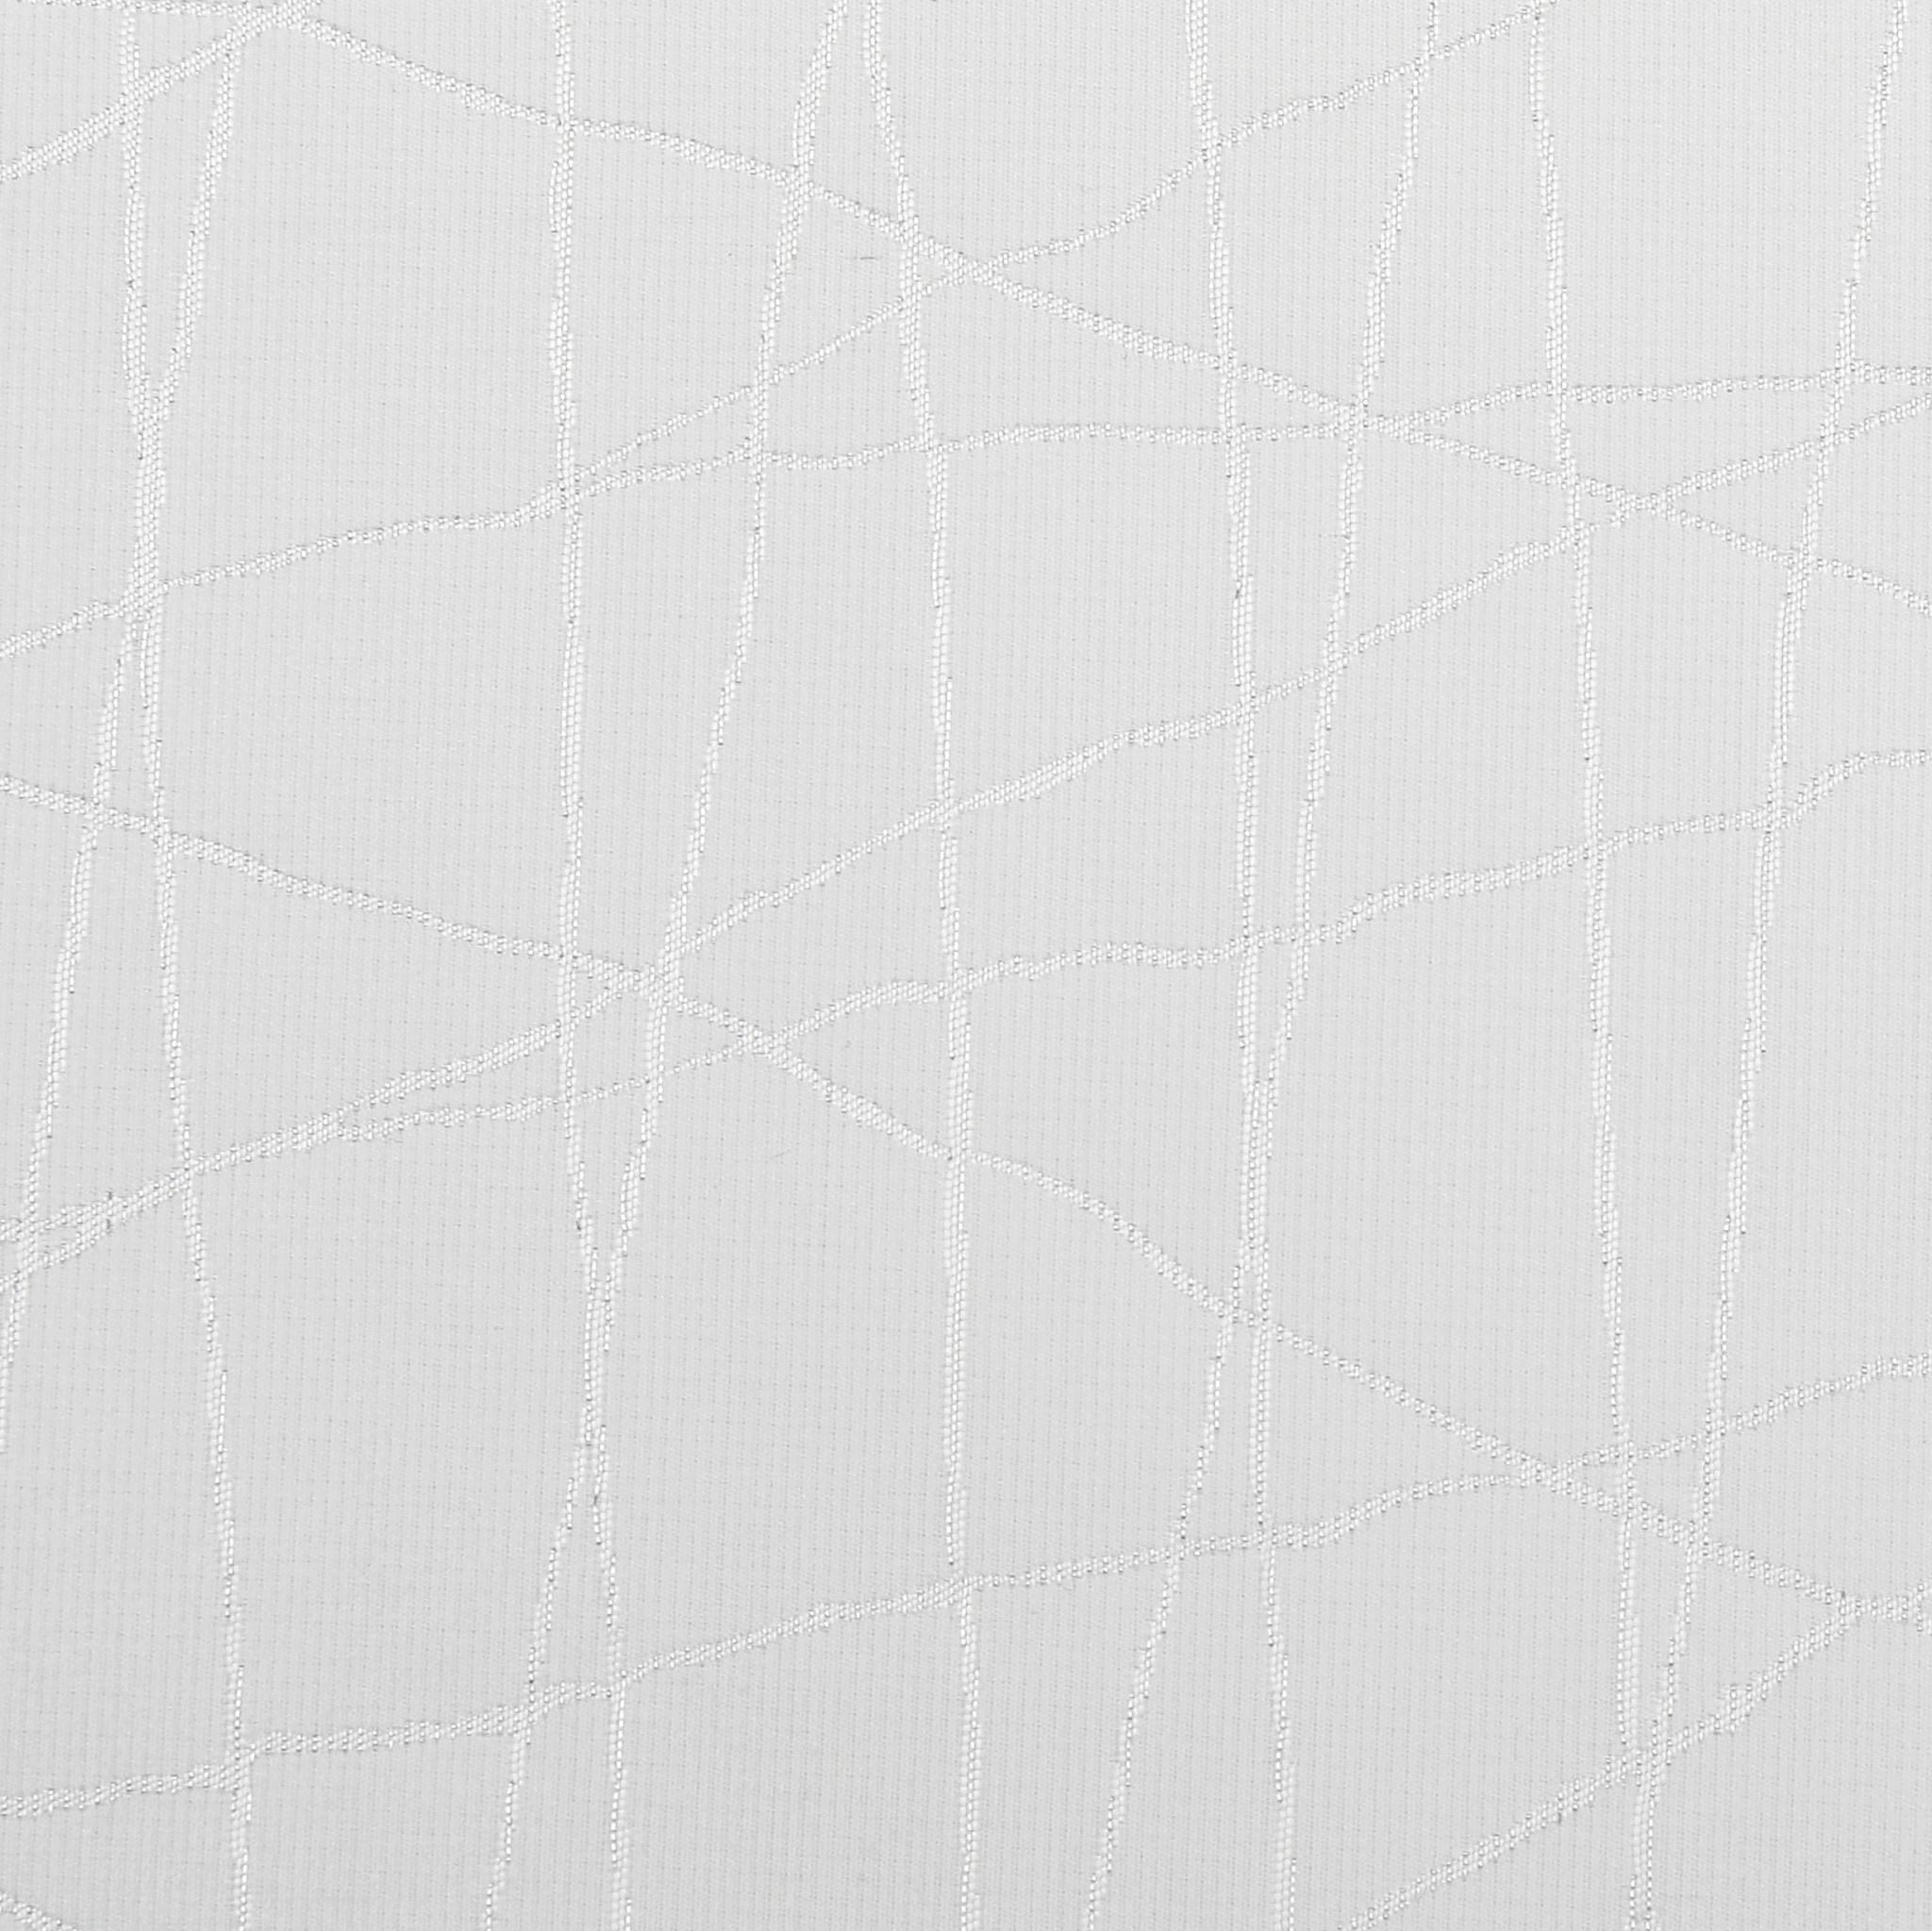 TC1333- 70 x 144 Jacquard White Silver Rays Tablecloth